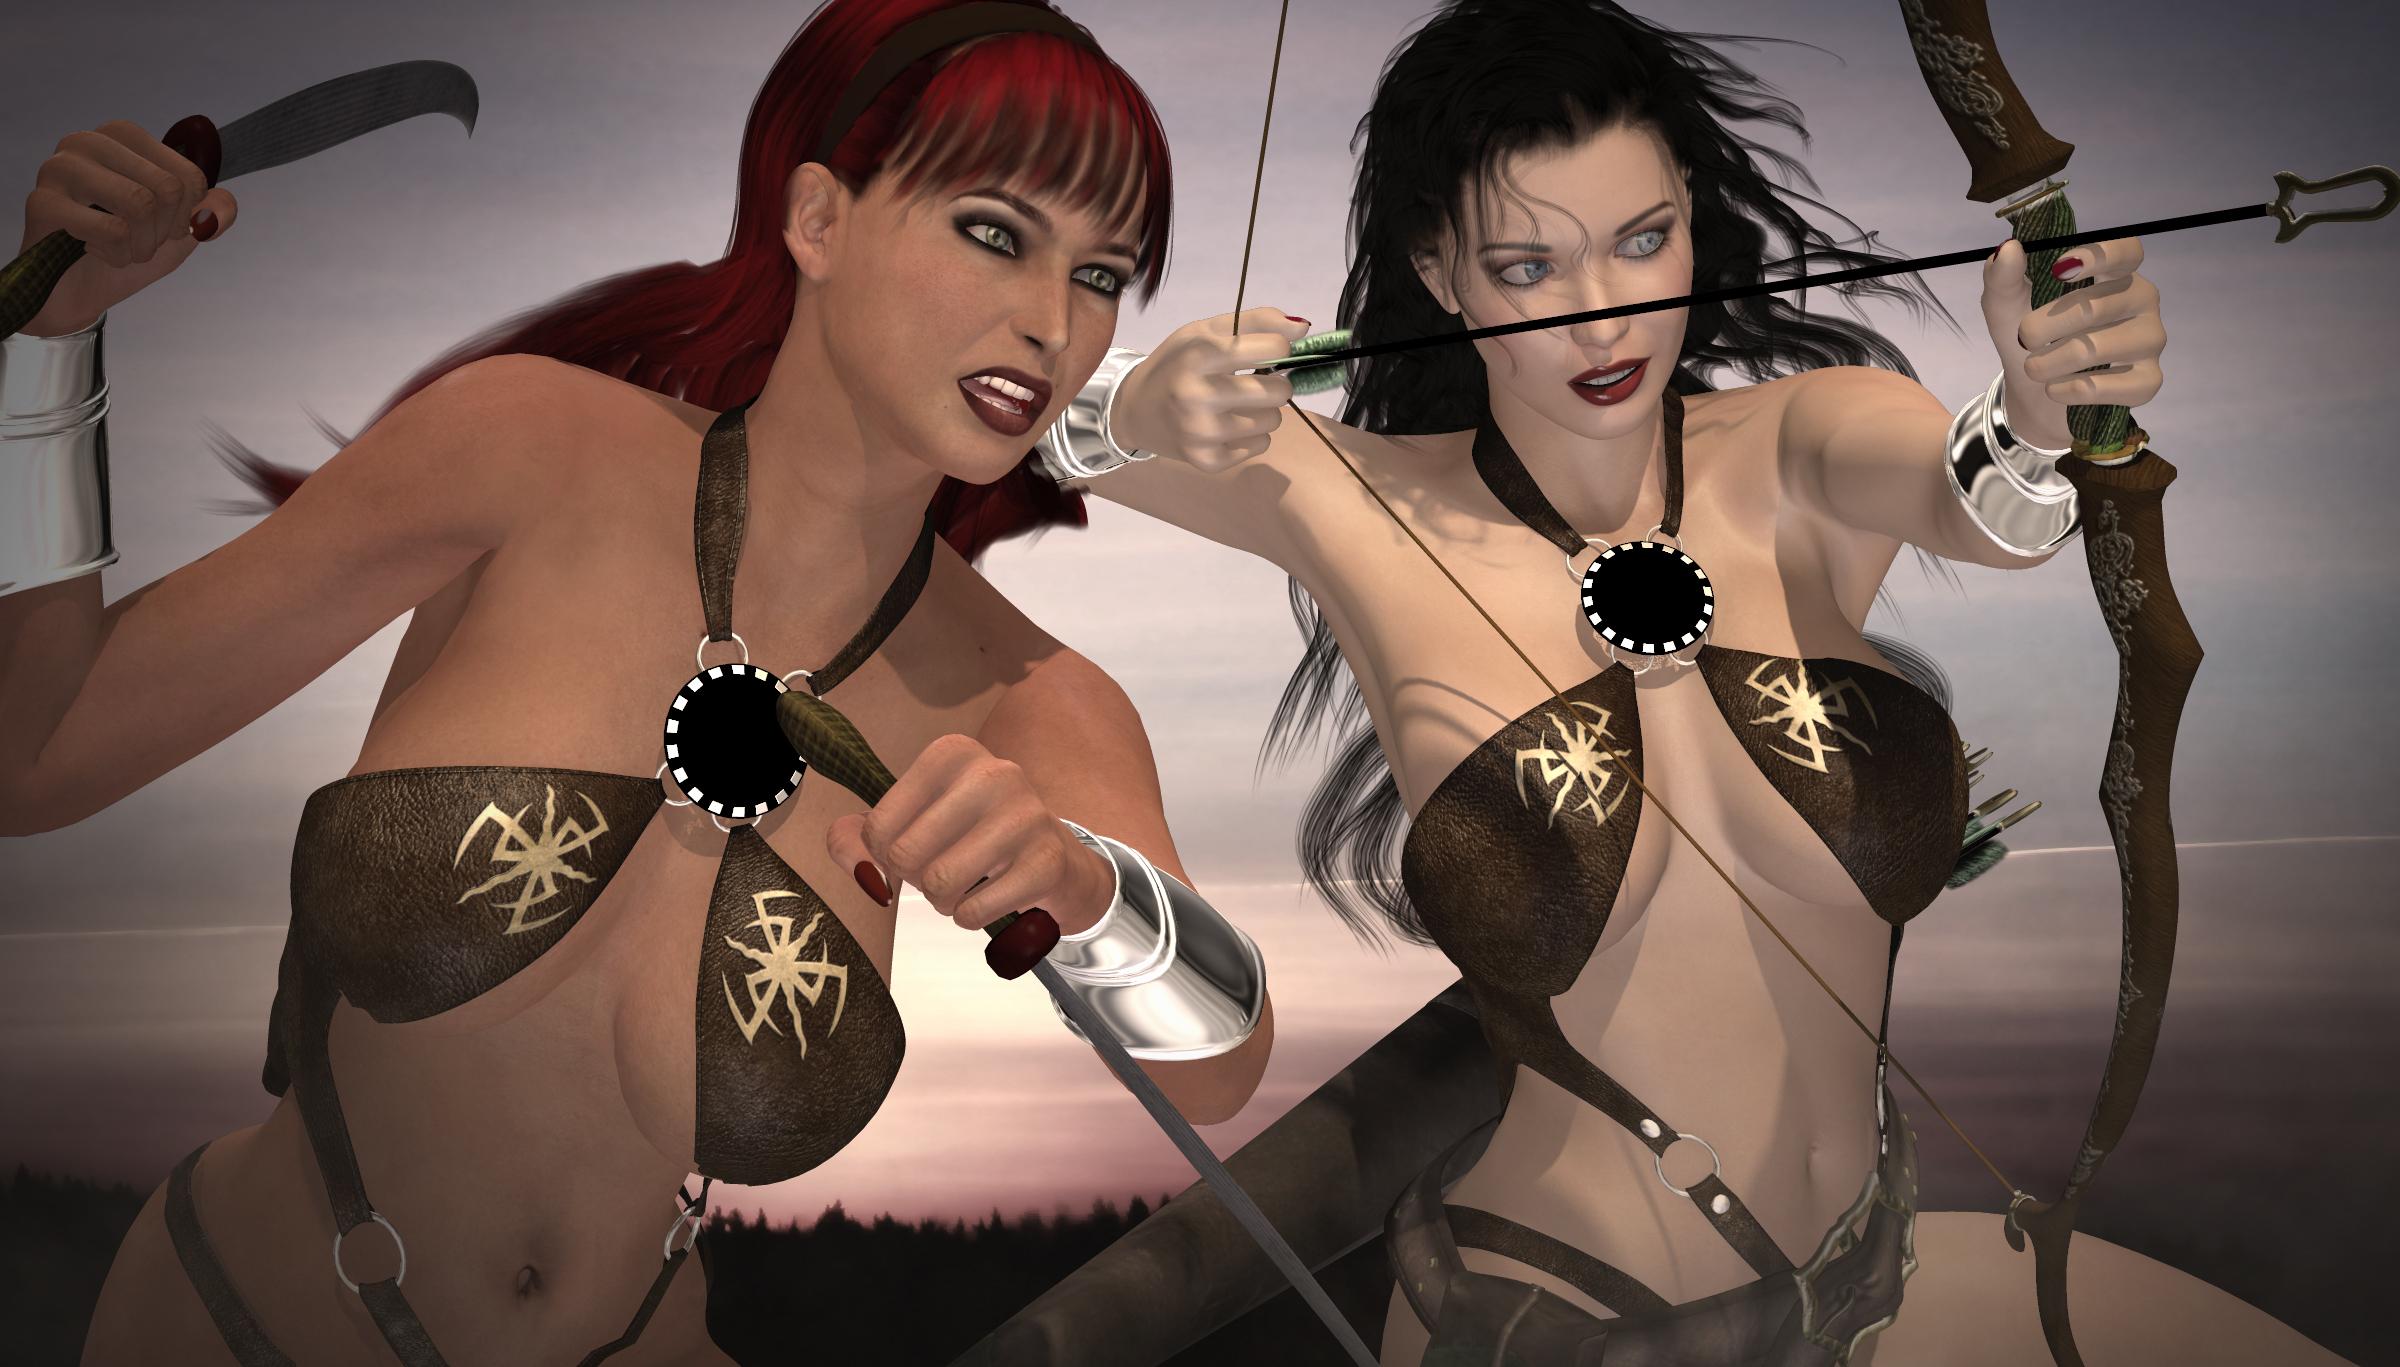 Free sex simulation games download xxx scenes